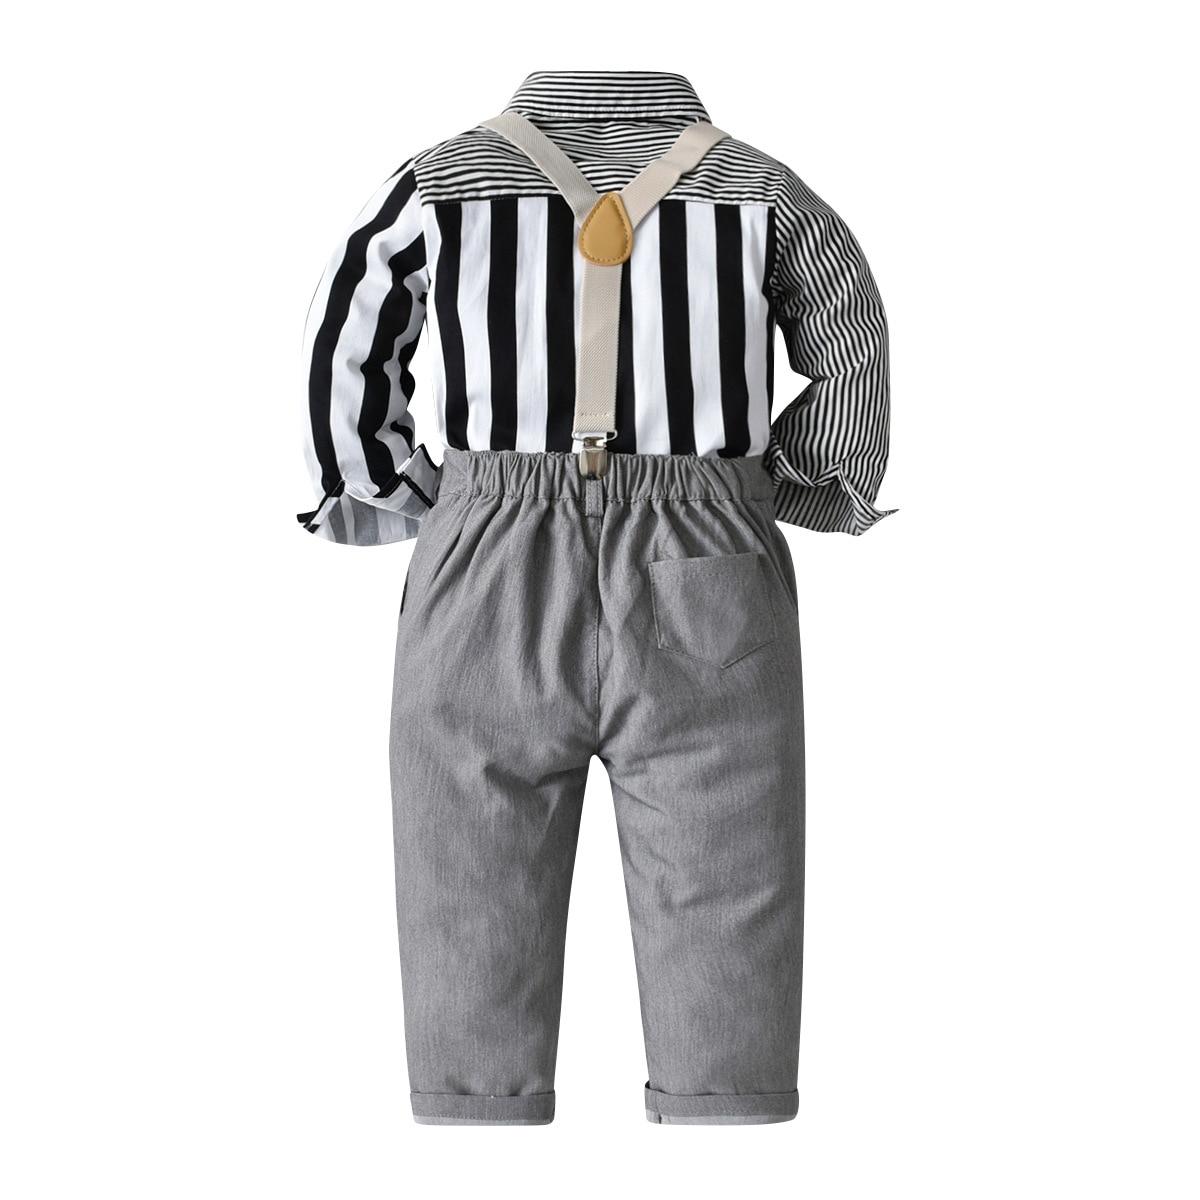 conjuntos de roupas cavalheiro para bebe 01